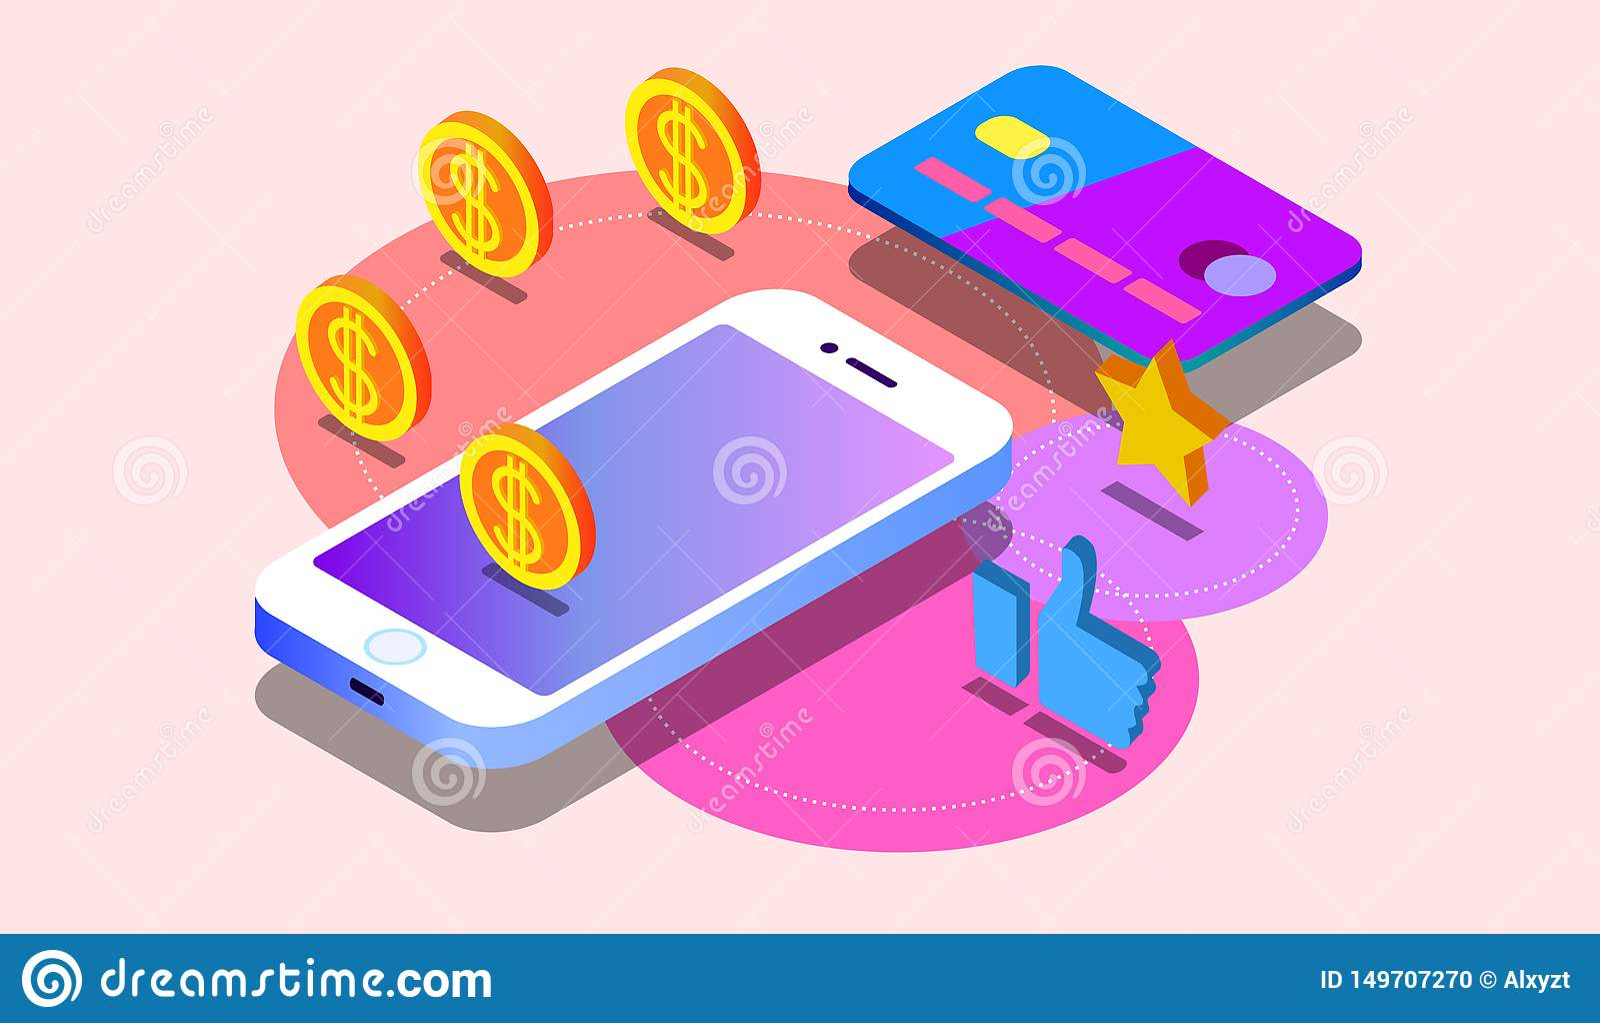 кредит онлайн денежный